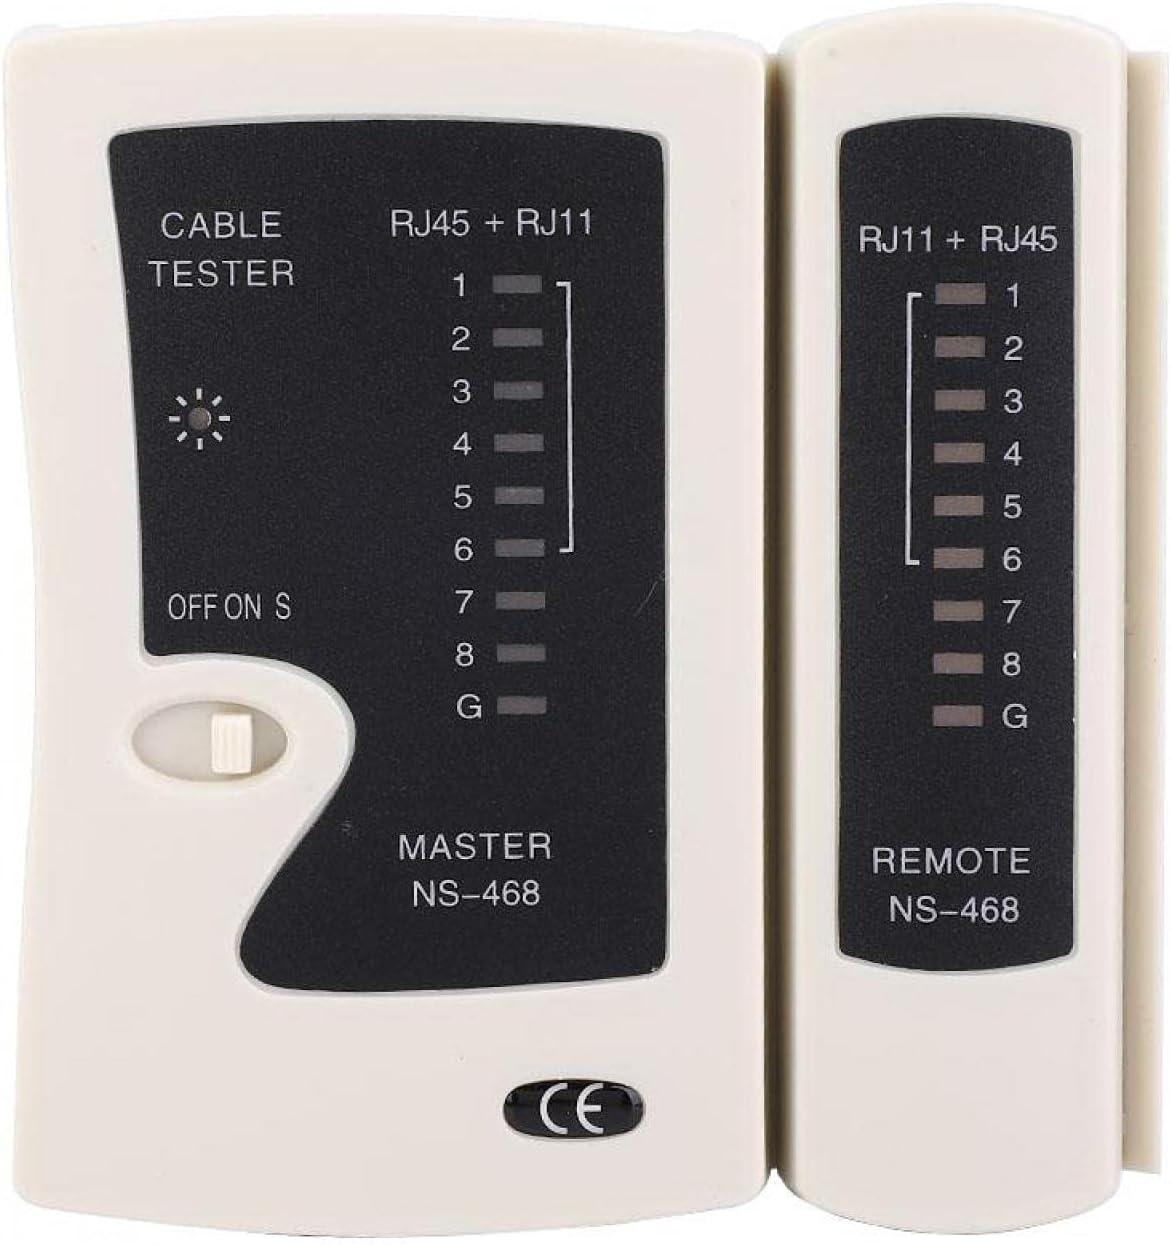 EVTSCAN Network Cable Tester Gifts RJ45 RJ12 Cheap mail order shopping RJ11 LAN Wir